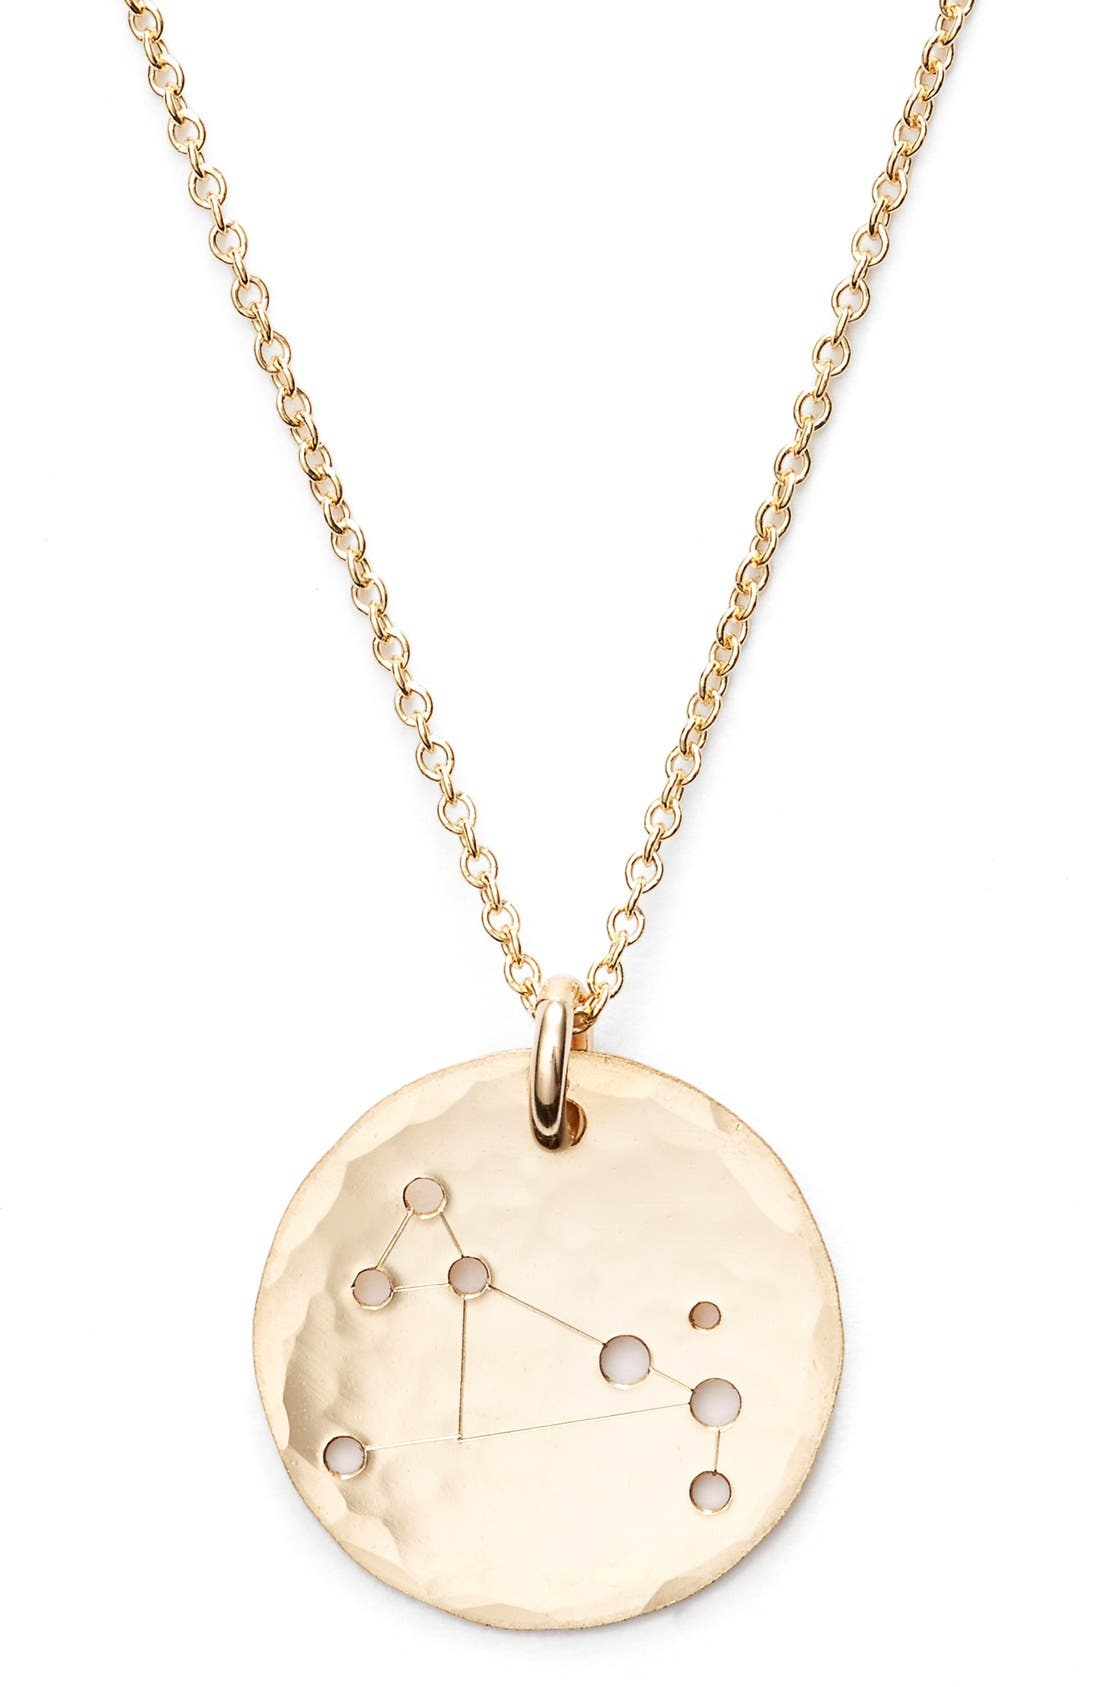 Ija 'Small Zodiac' 14k-Gold Fill Necklace,                             Alternate thumbnail 25, color,